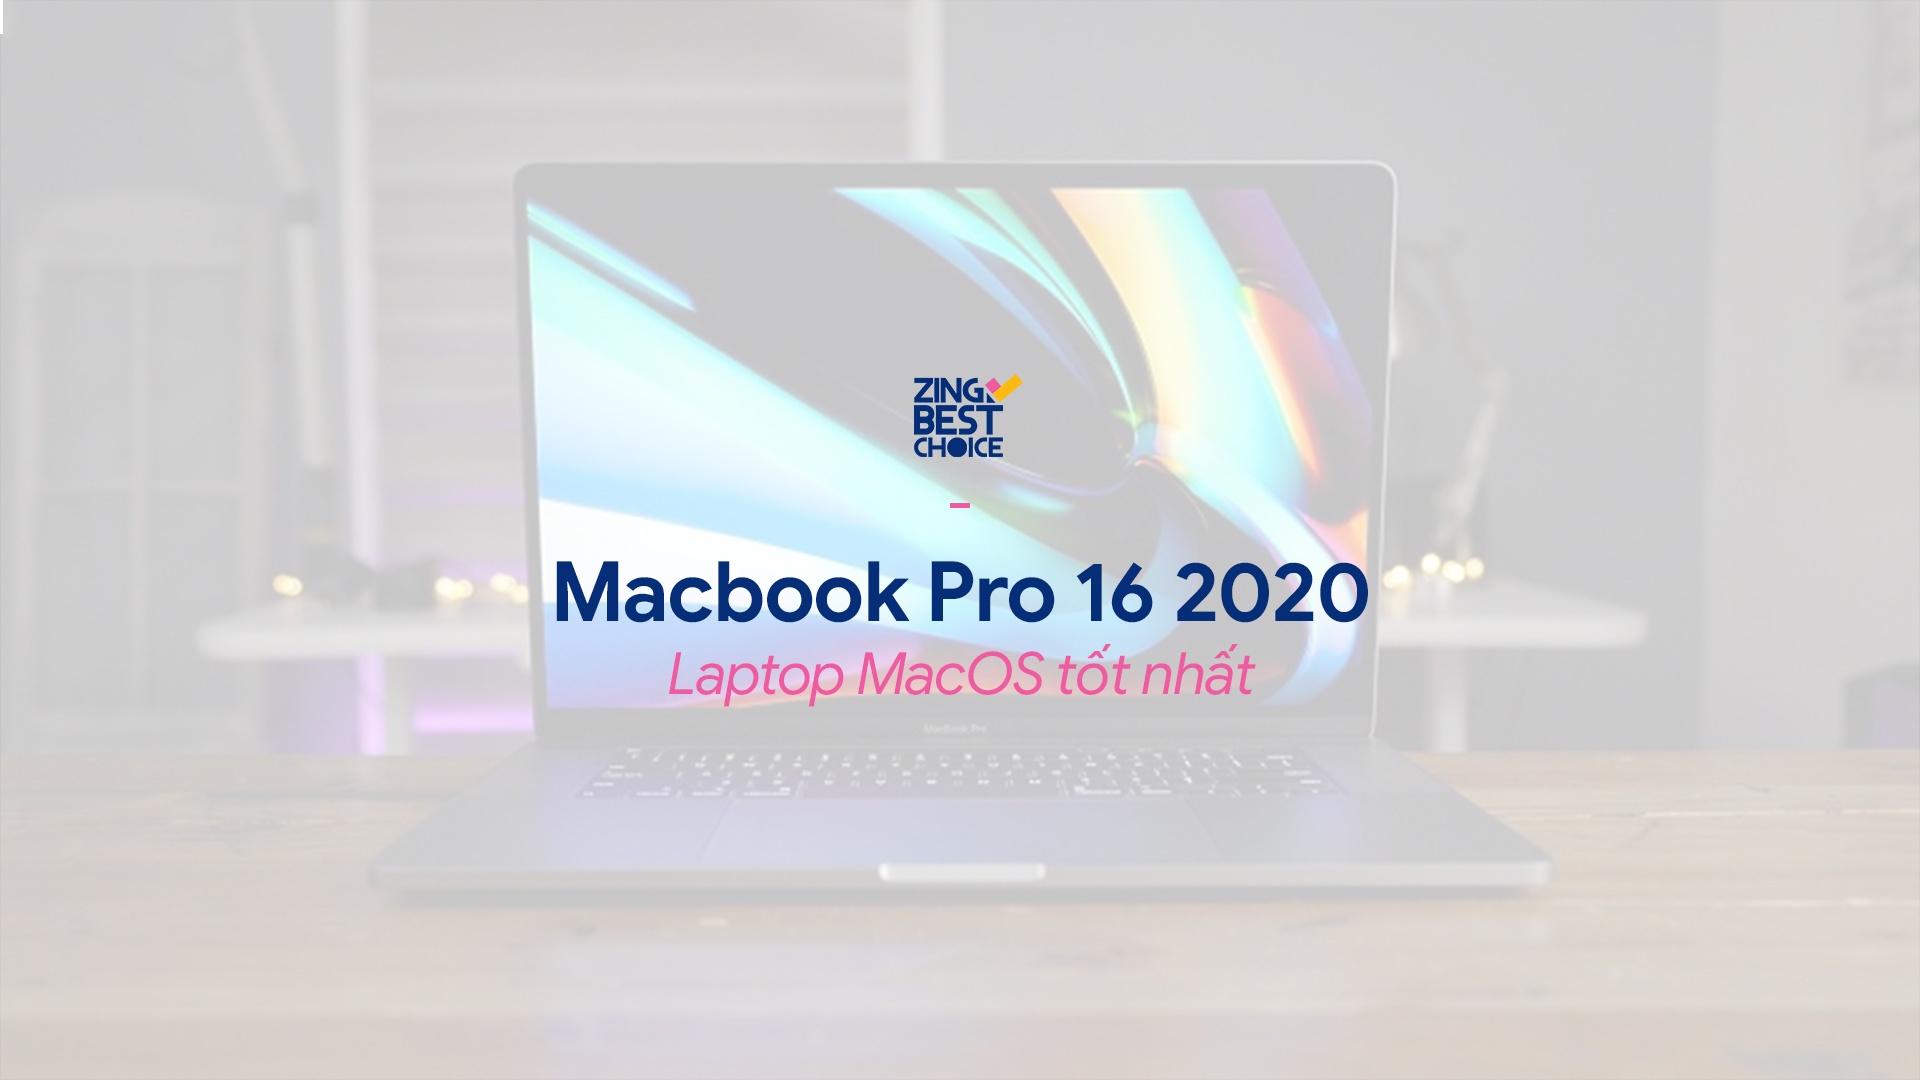 Top 5 laptop tot nhat tinh den dau nam 2020 hinh anh 1 Macbook.jpg